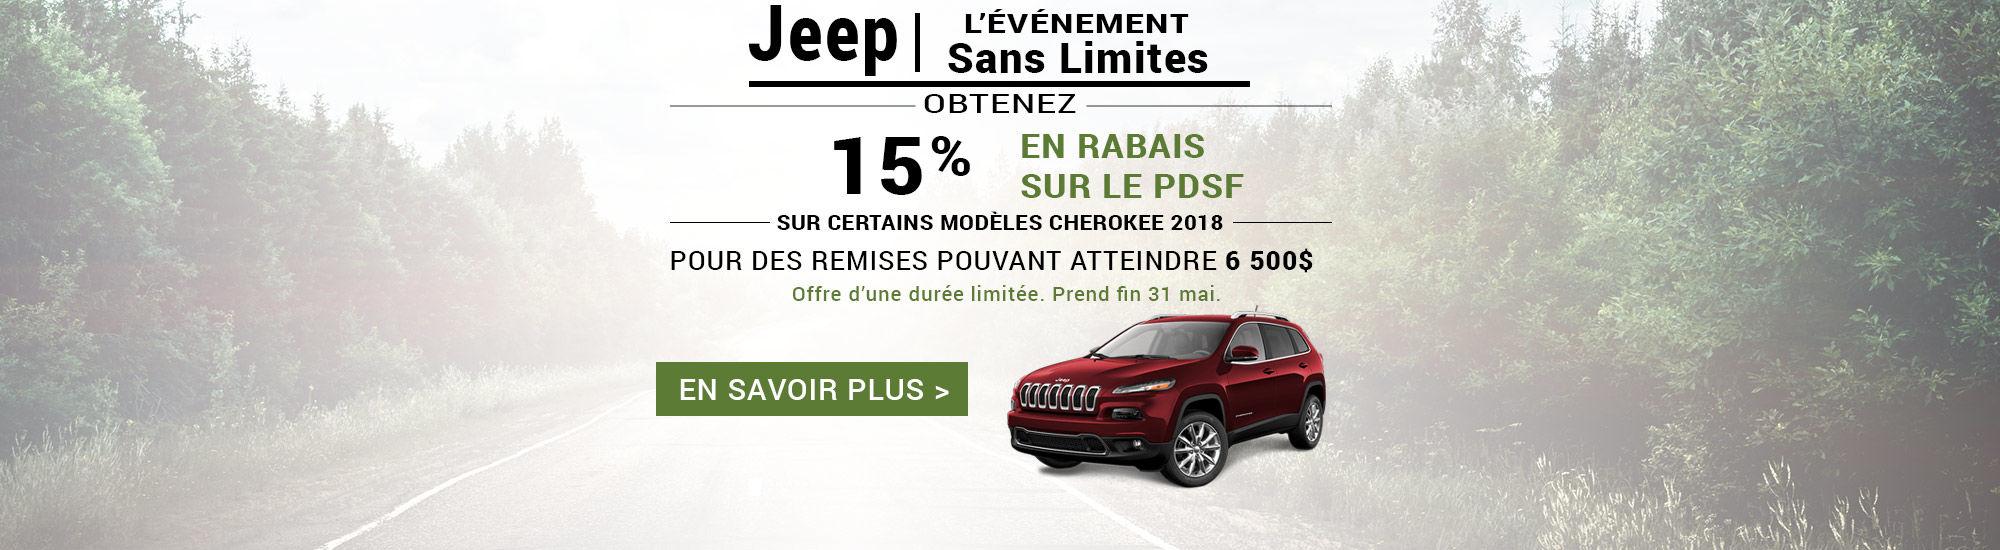 jeep mois